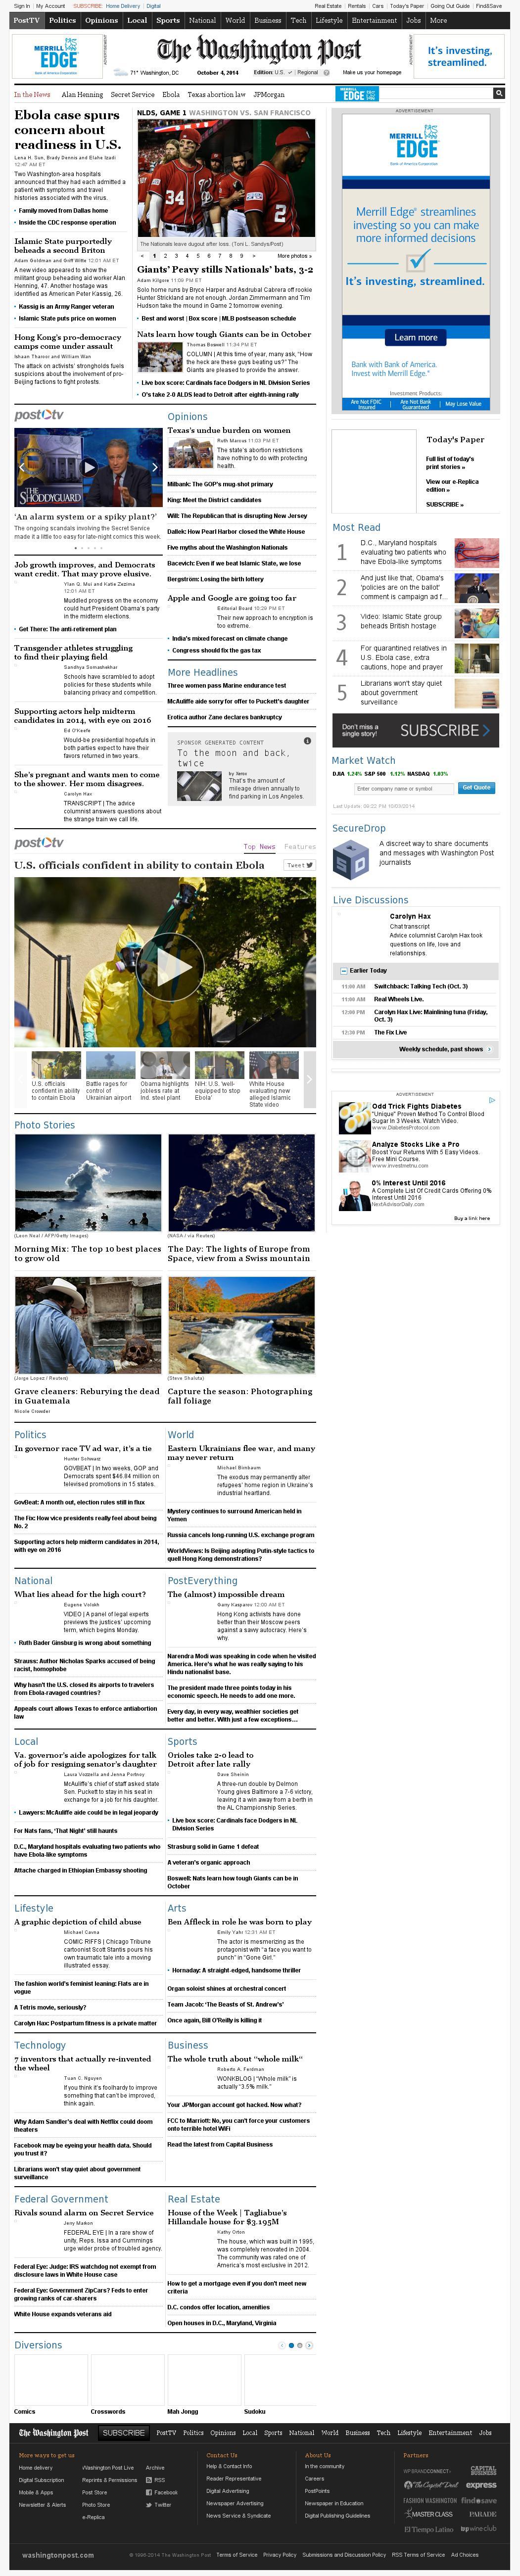 The Washington Post at Saturday Oct. 4, 2014, 1:27 a.m. UTC